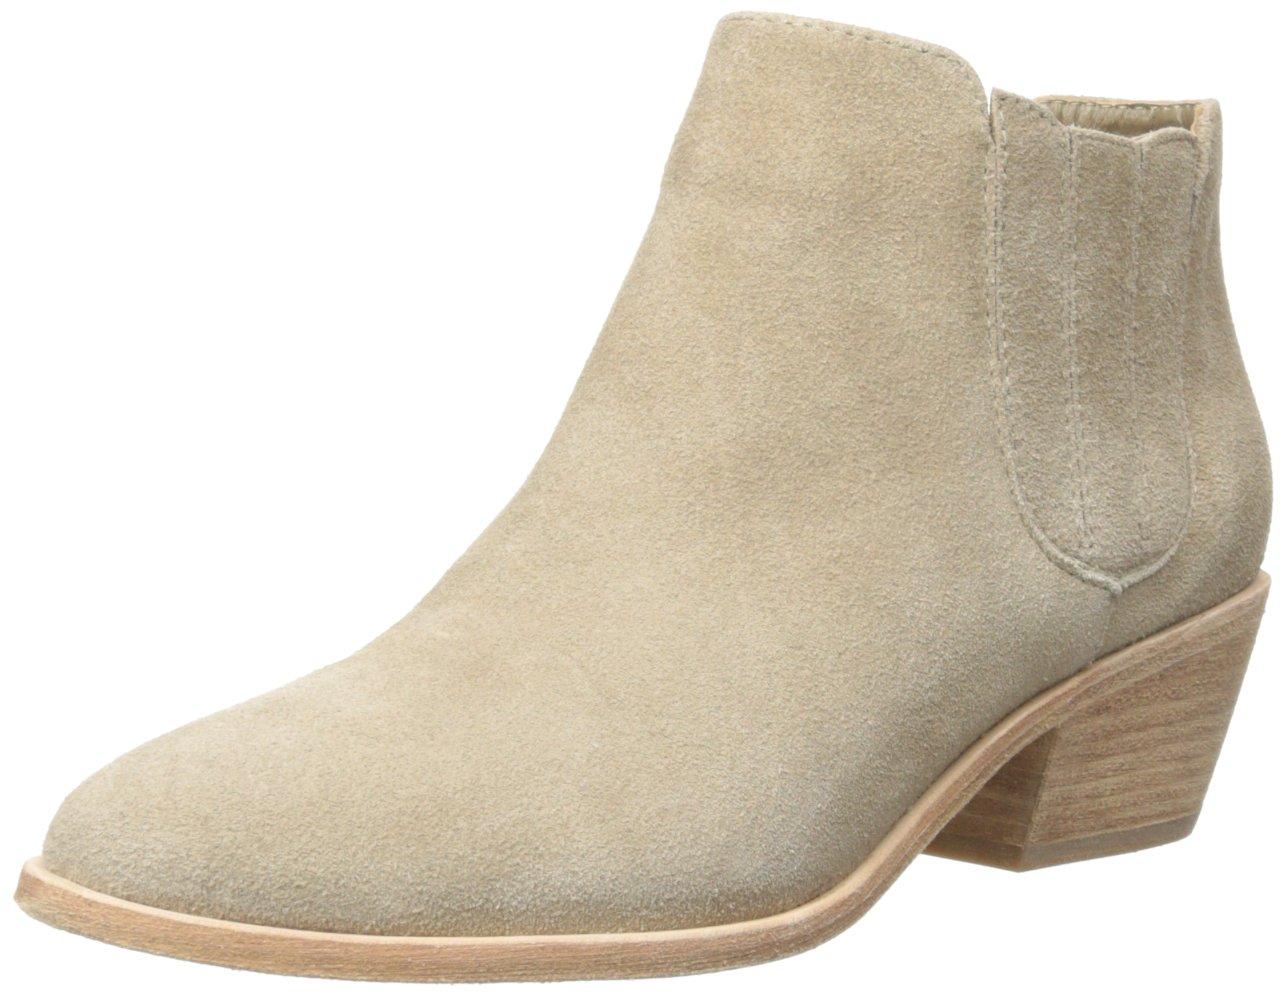 Joie Women's Barlow Boot B00JJ2YF5Q 39.5 M EU / 9.5 B(M) US|Cement